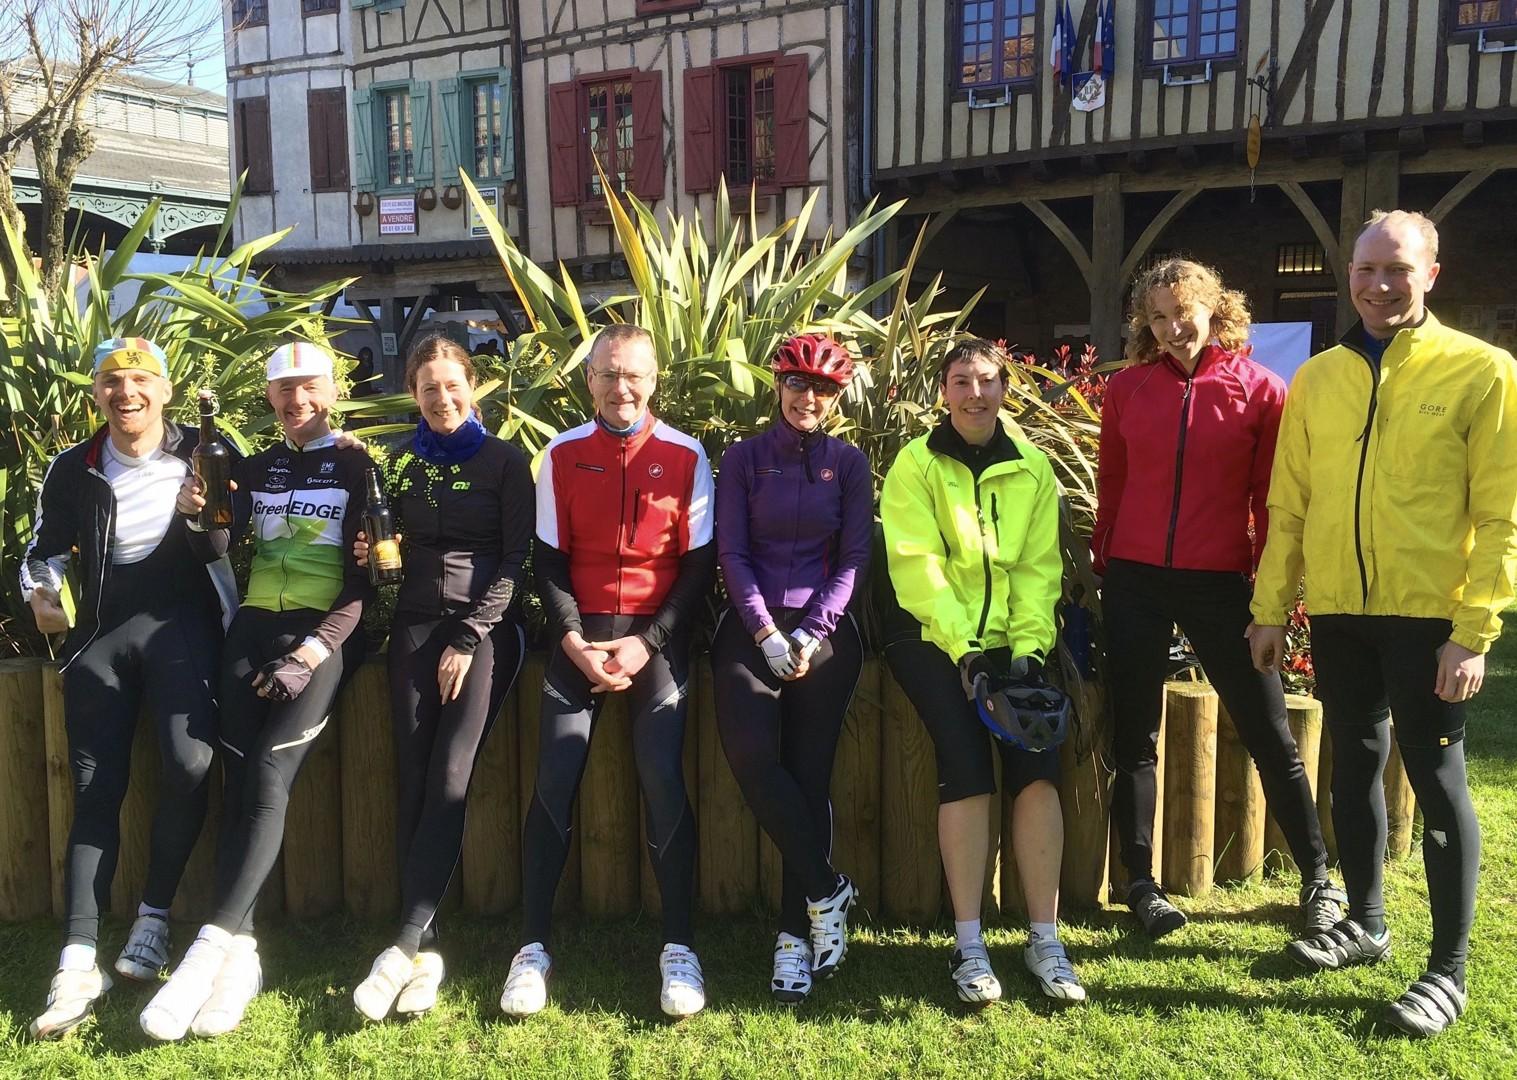 group-road-cycling-holiday-france-pyrenees-fitness-week.jpg - France - Pyrenees Fitness Week - Guided Road Cycling Holiday (Grade 3-4) - Road Cycling